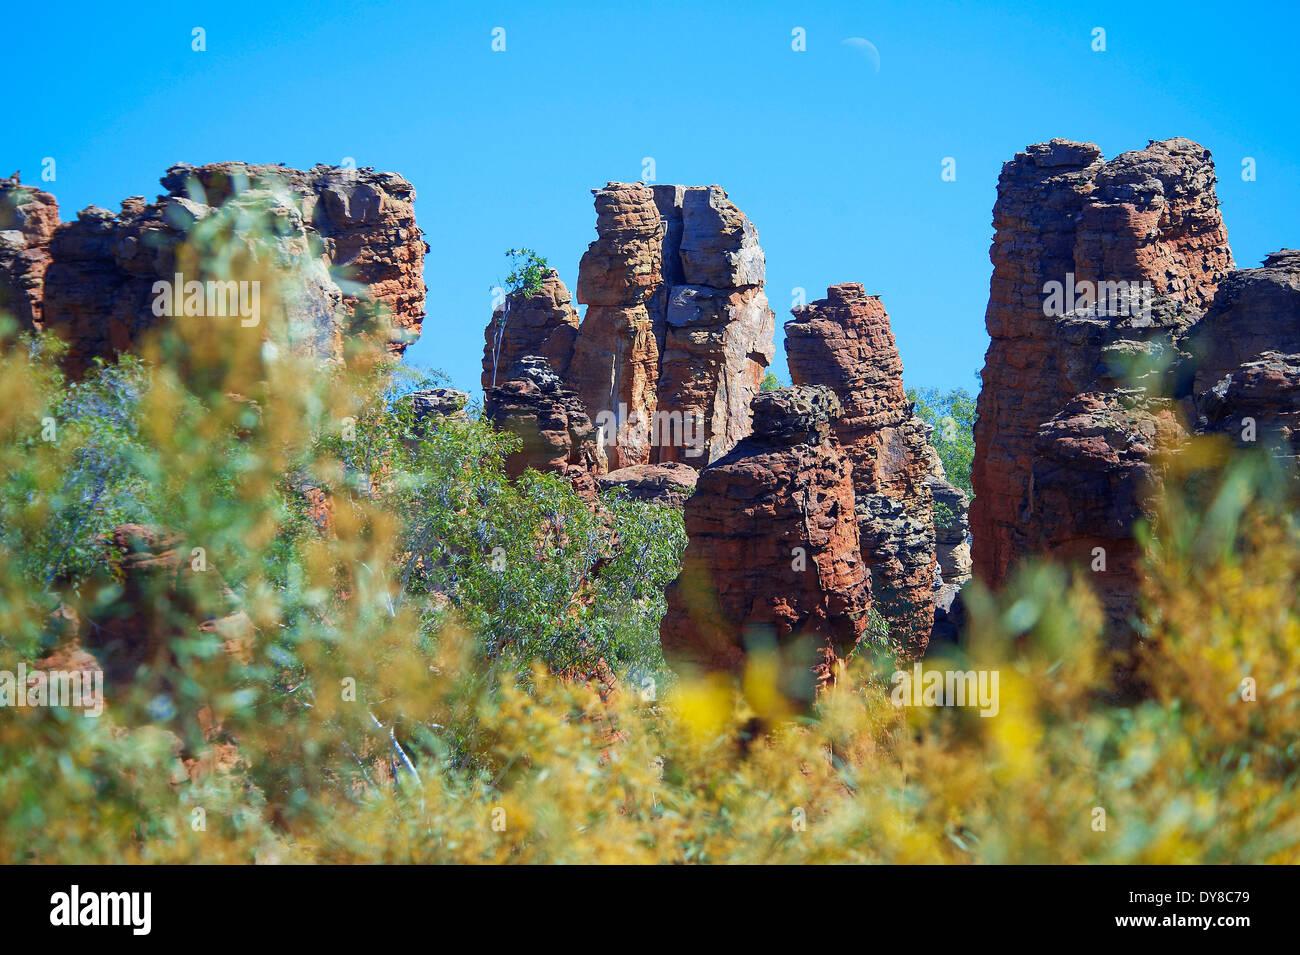 Australien, verlorene Stadt, Northern Territory, Roper, Limmen, Nationalpark, Klippe Bildung, Klippe Stockbild